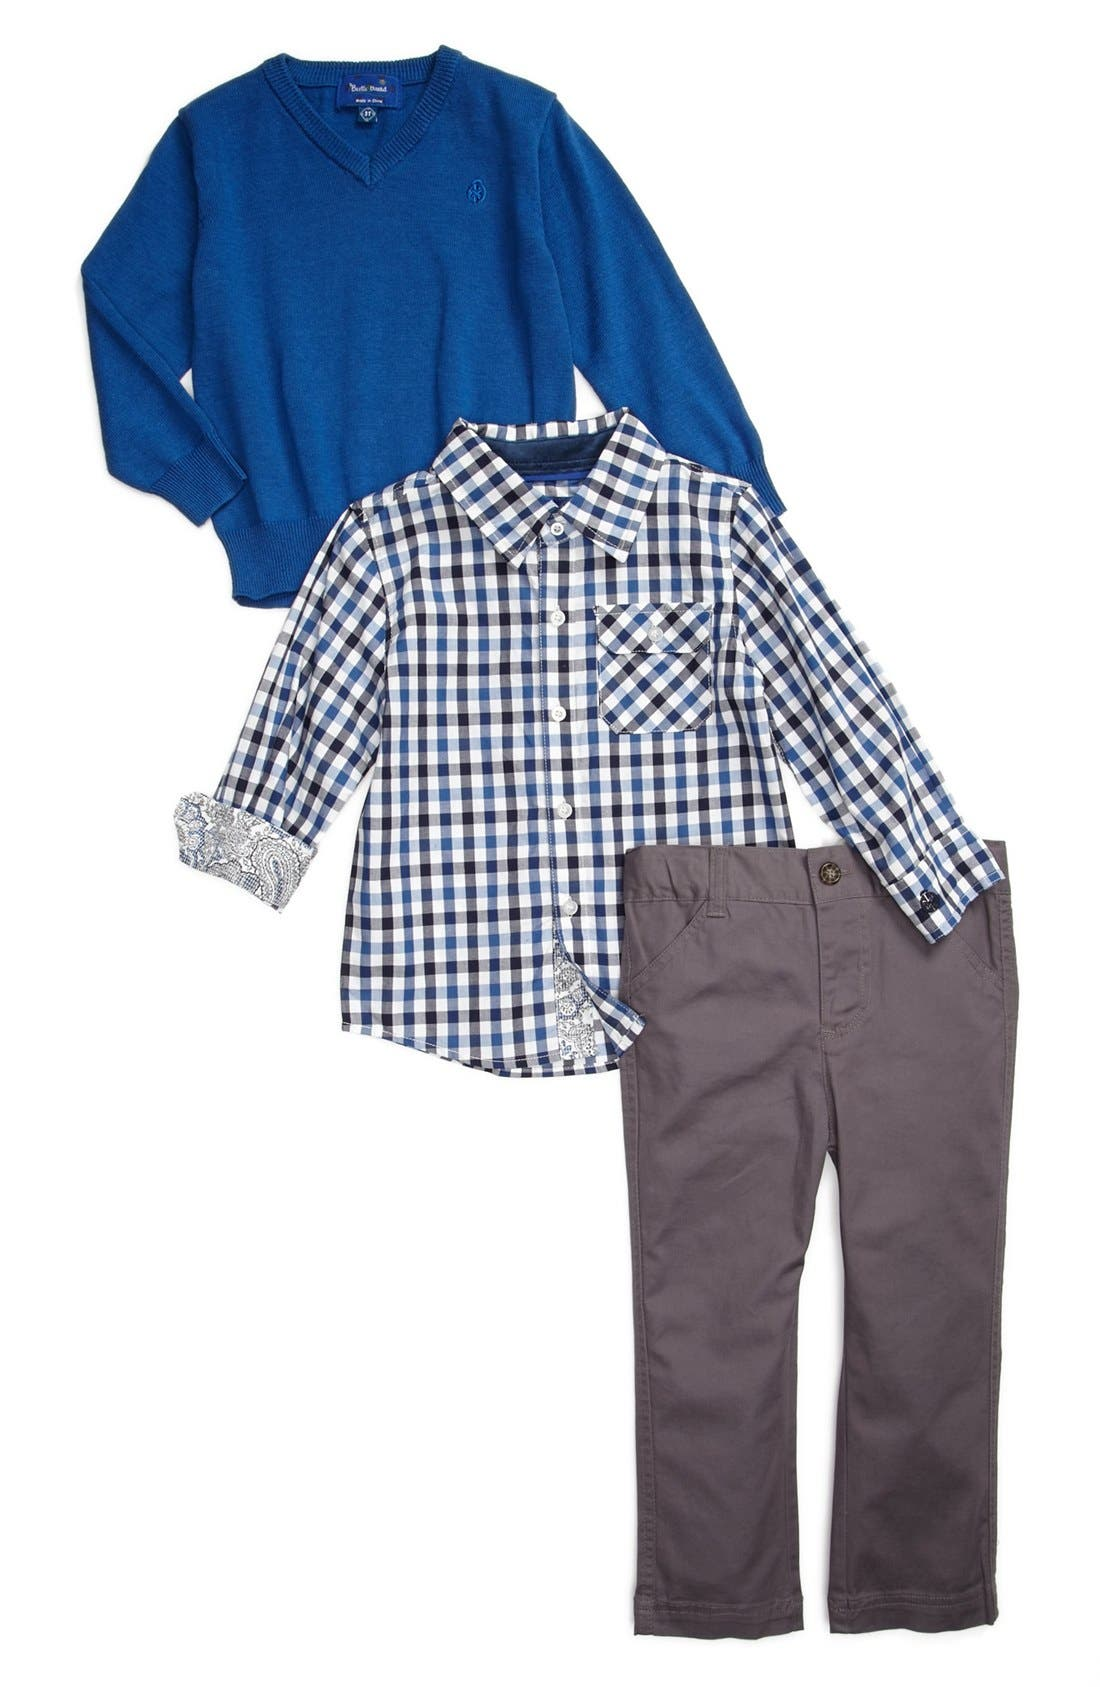 Main Image - Beetle & Thread Sweater, Sport Shirt & Pants (Toddler Boys)